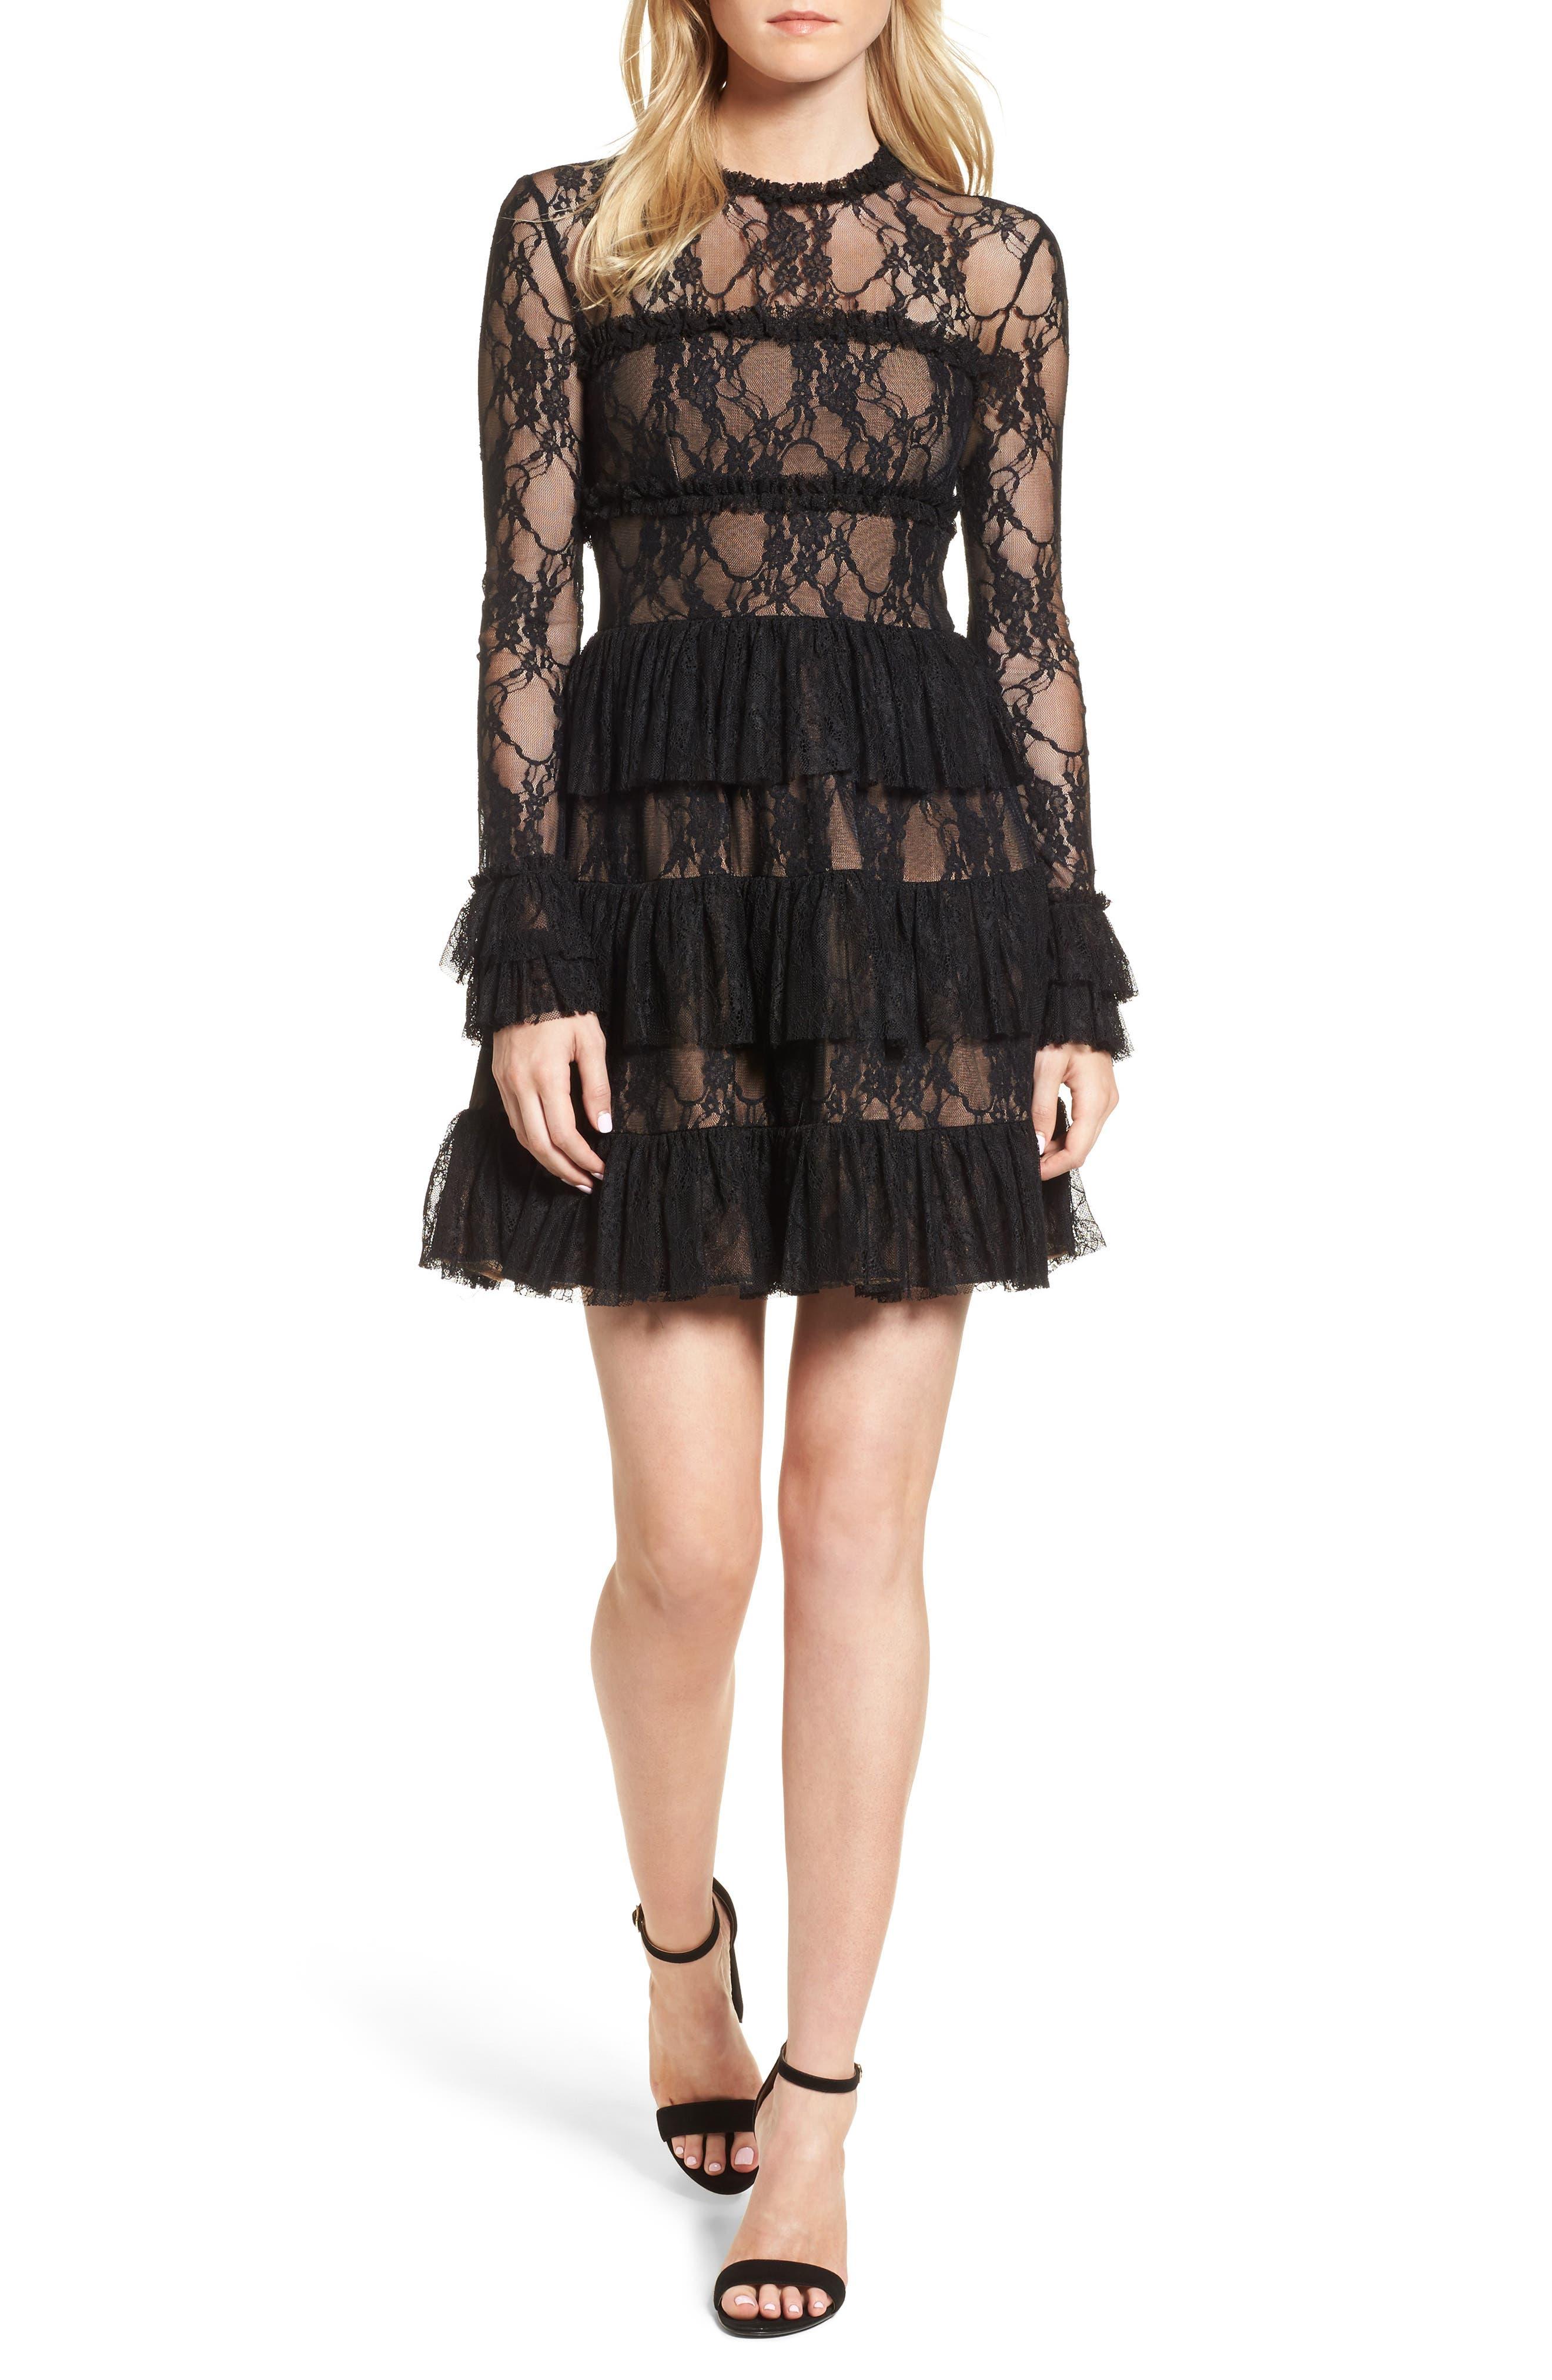 Main Image - Bailey 44 Feeding Circle A-Line Lace Dress